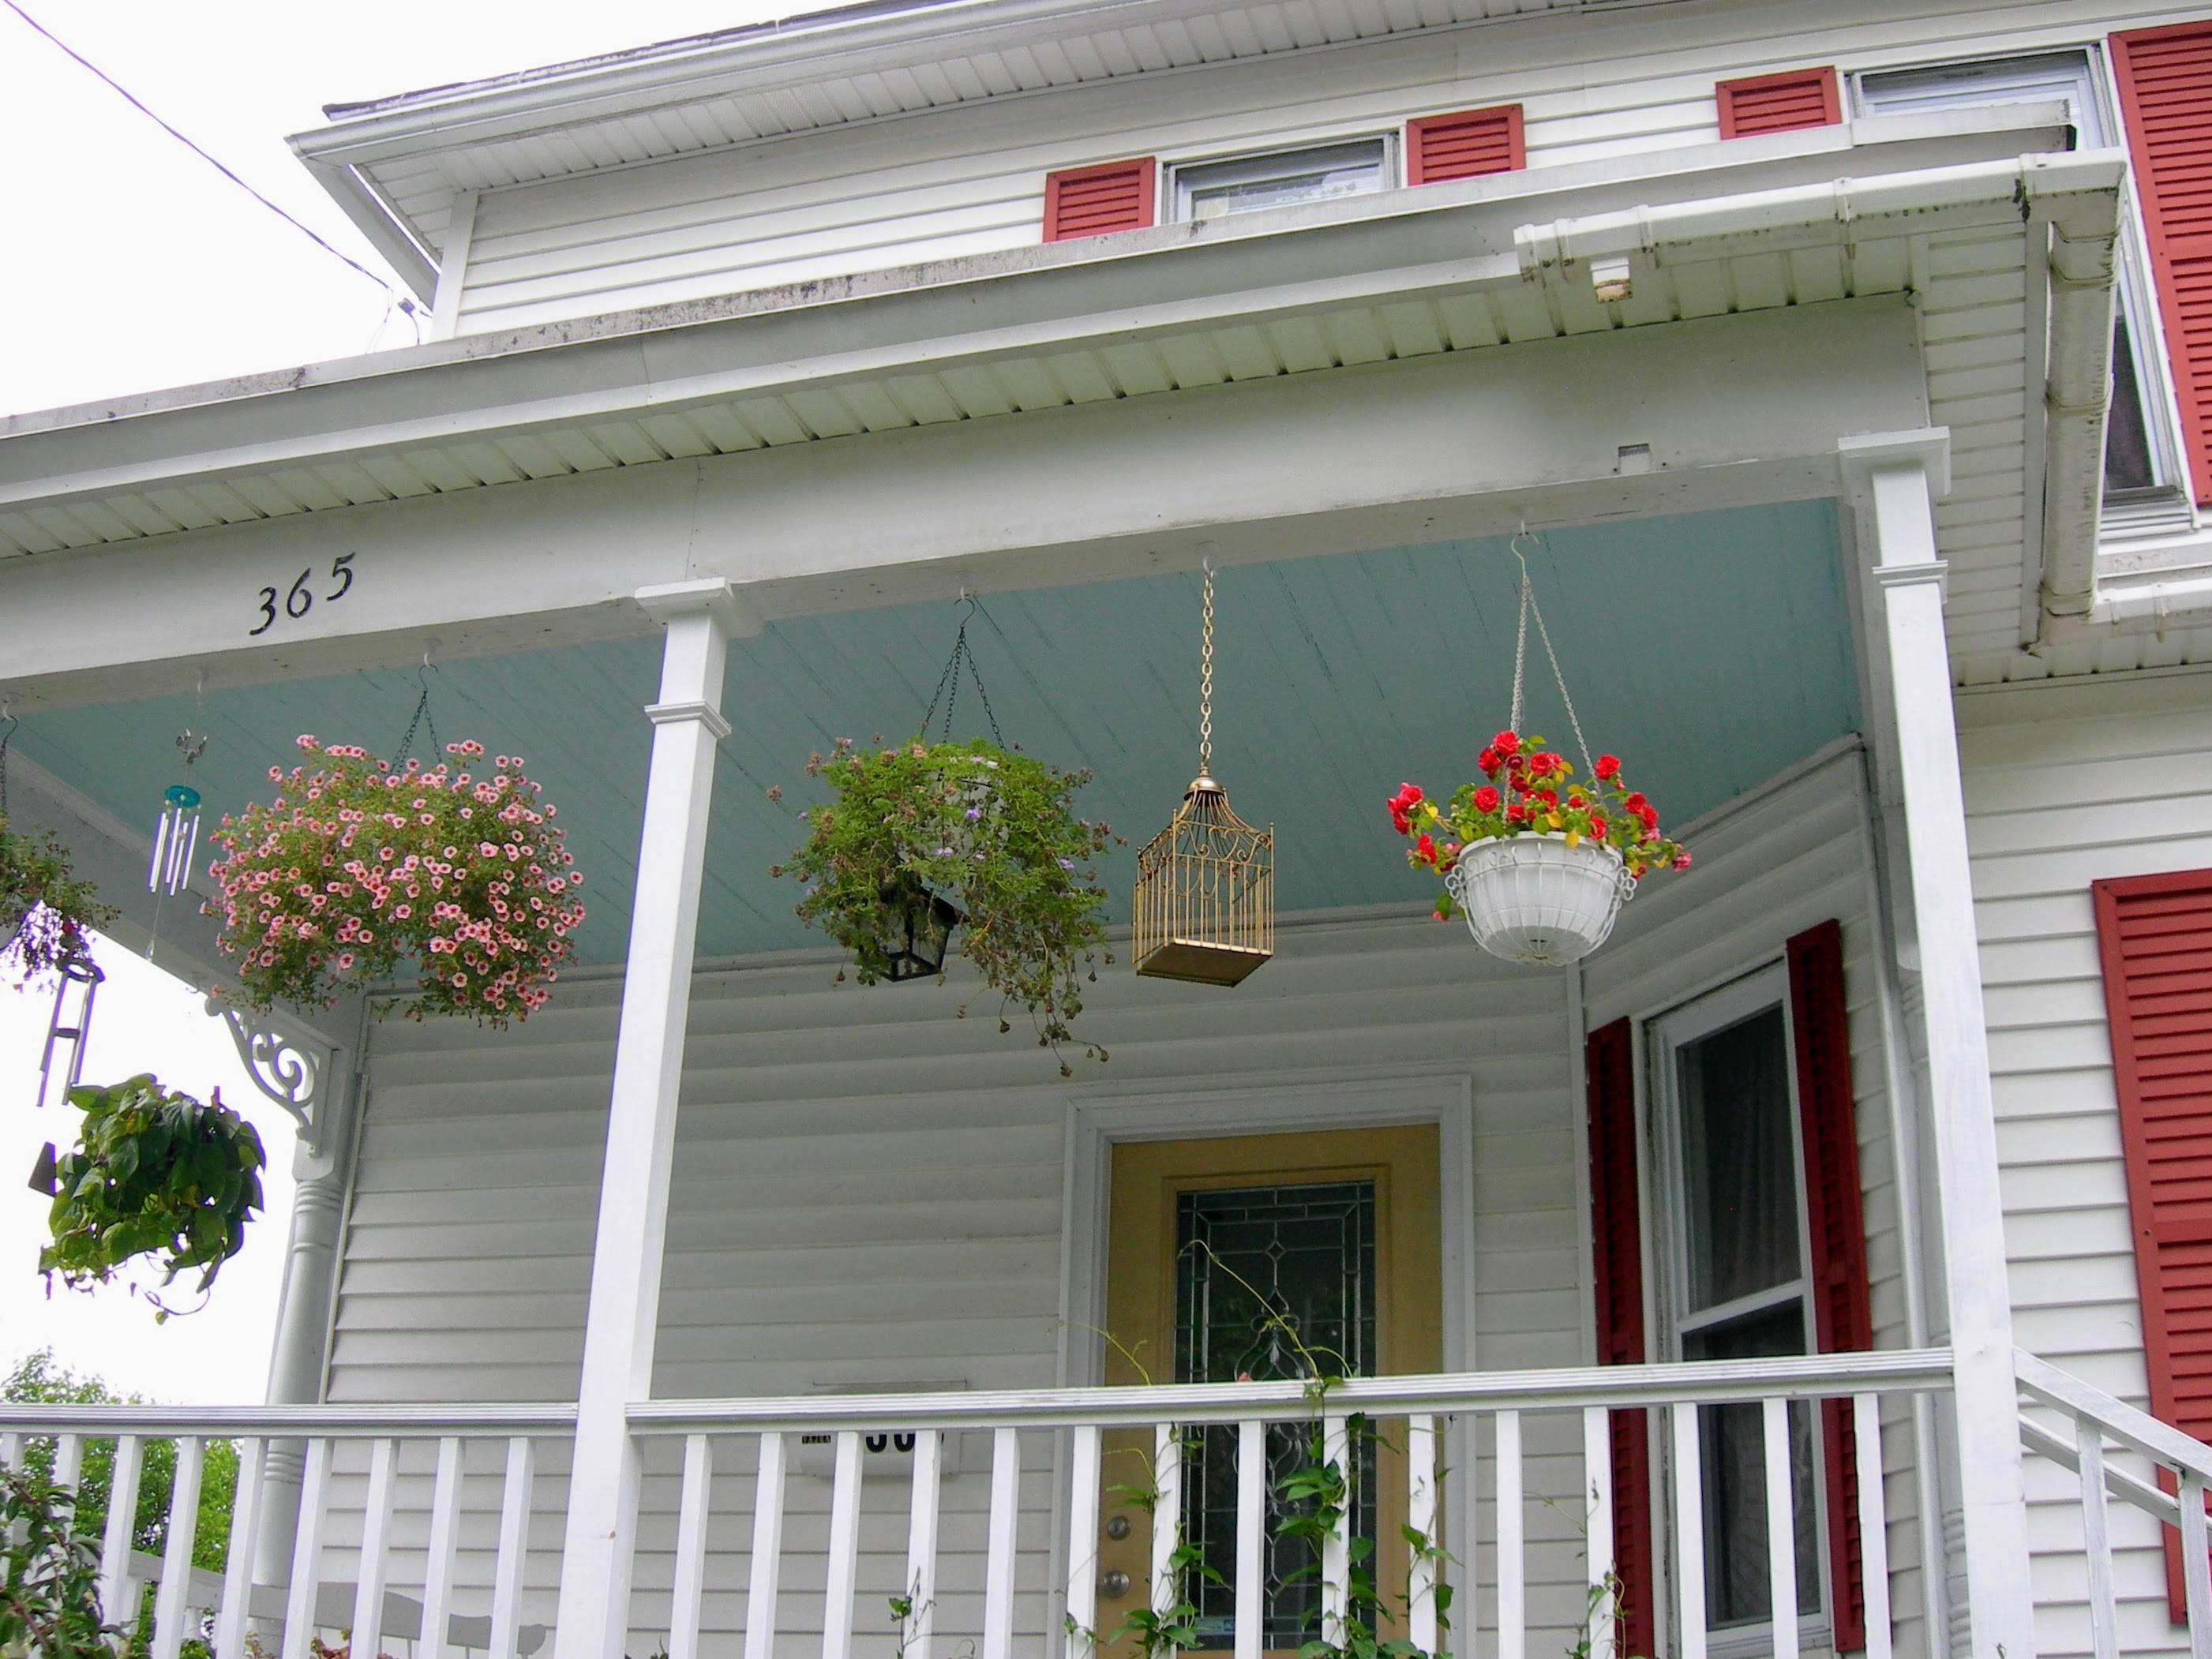 Haint blue Victorian porch ceiling